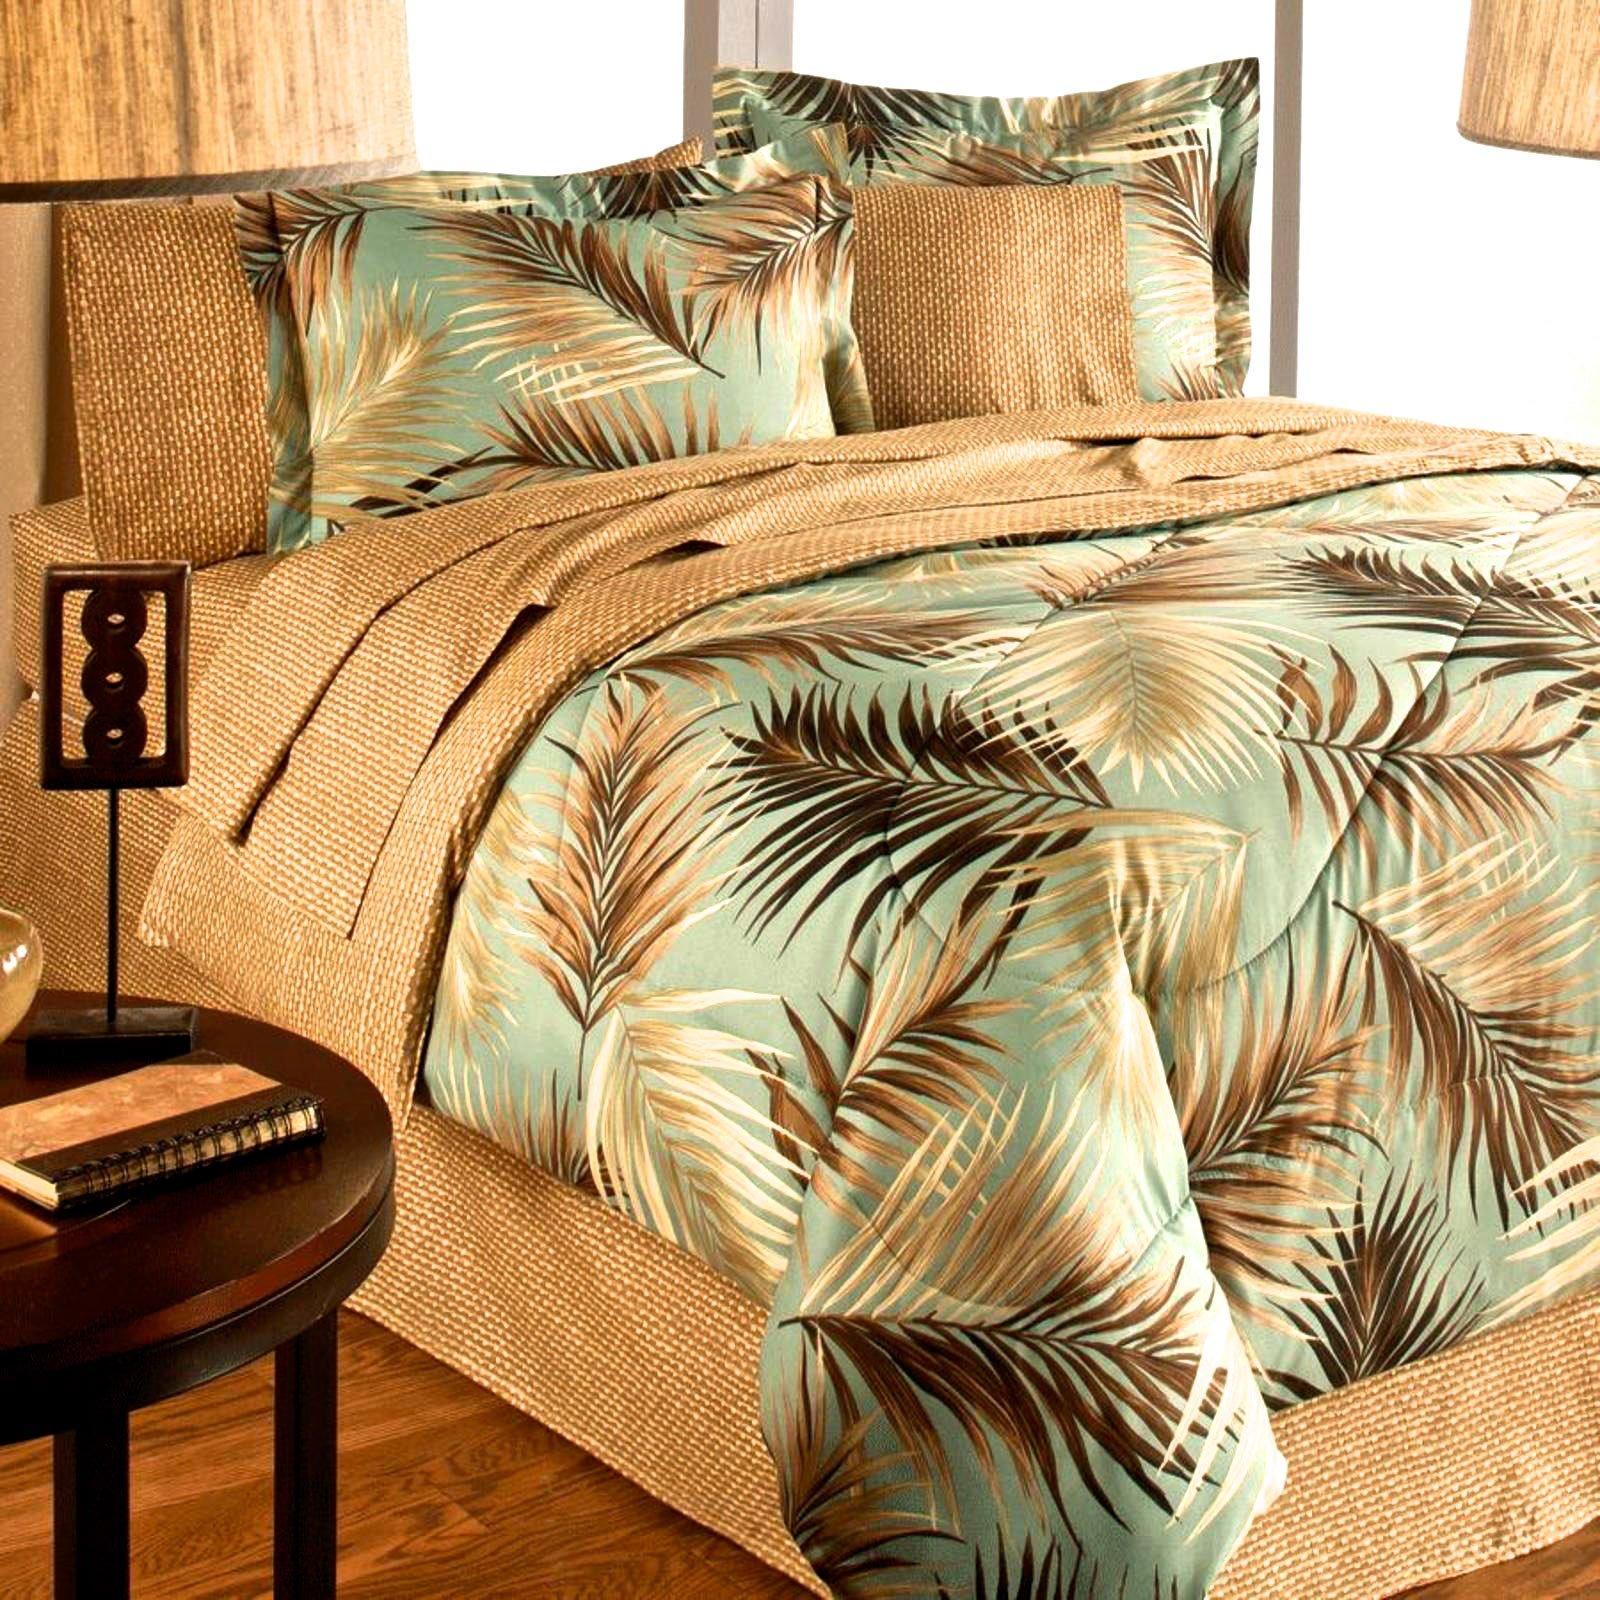 Tropical Palm Tree Leaf Leaves Ocean Beach Coastal Bedding